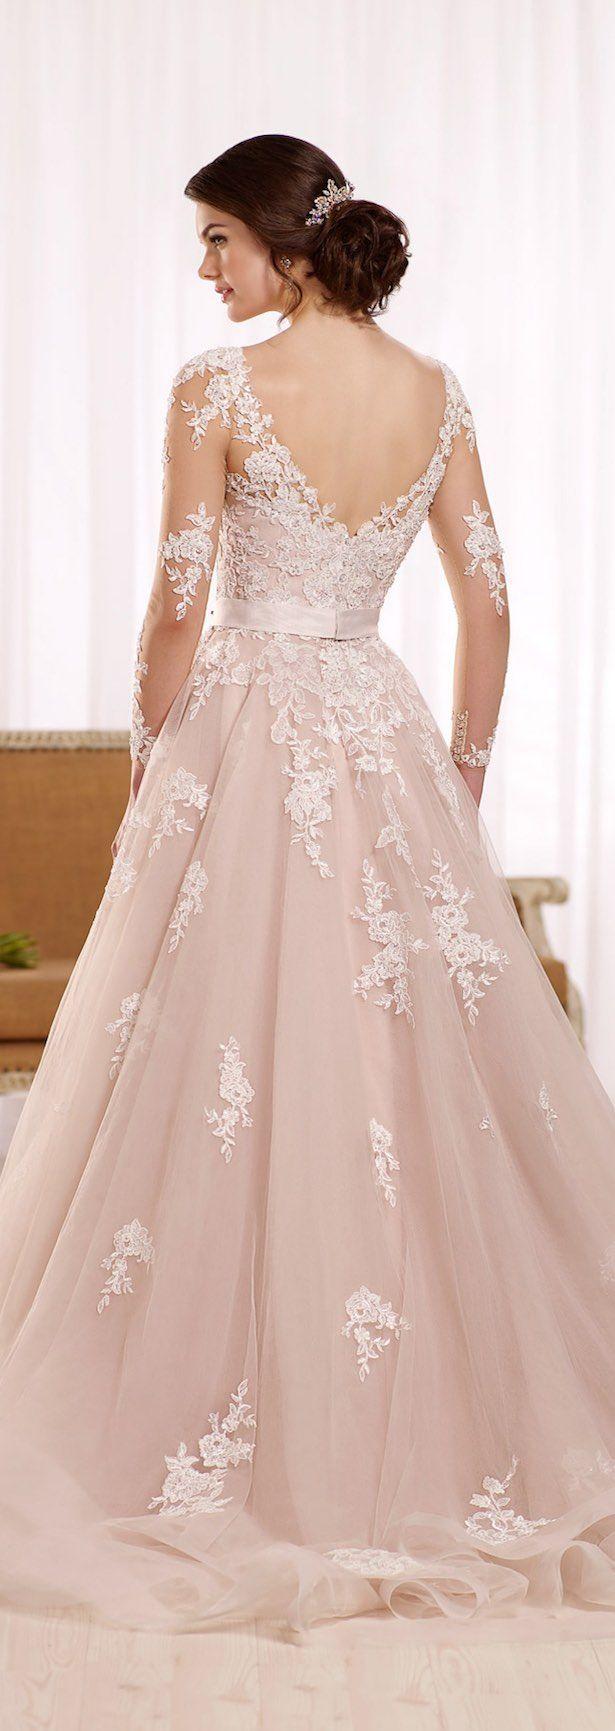 1737 best Weddings images on Pinterest | Wedding dressses, Wedding ...